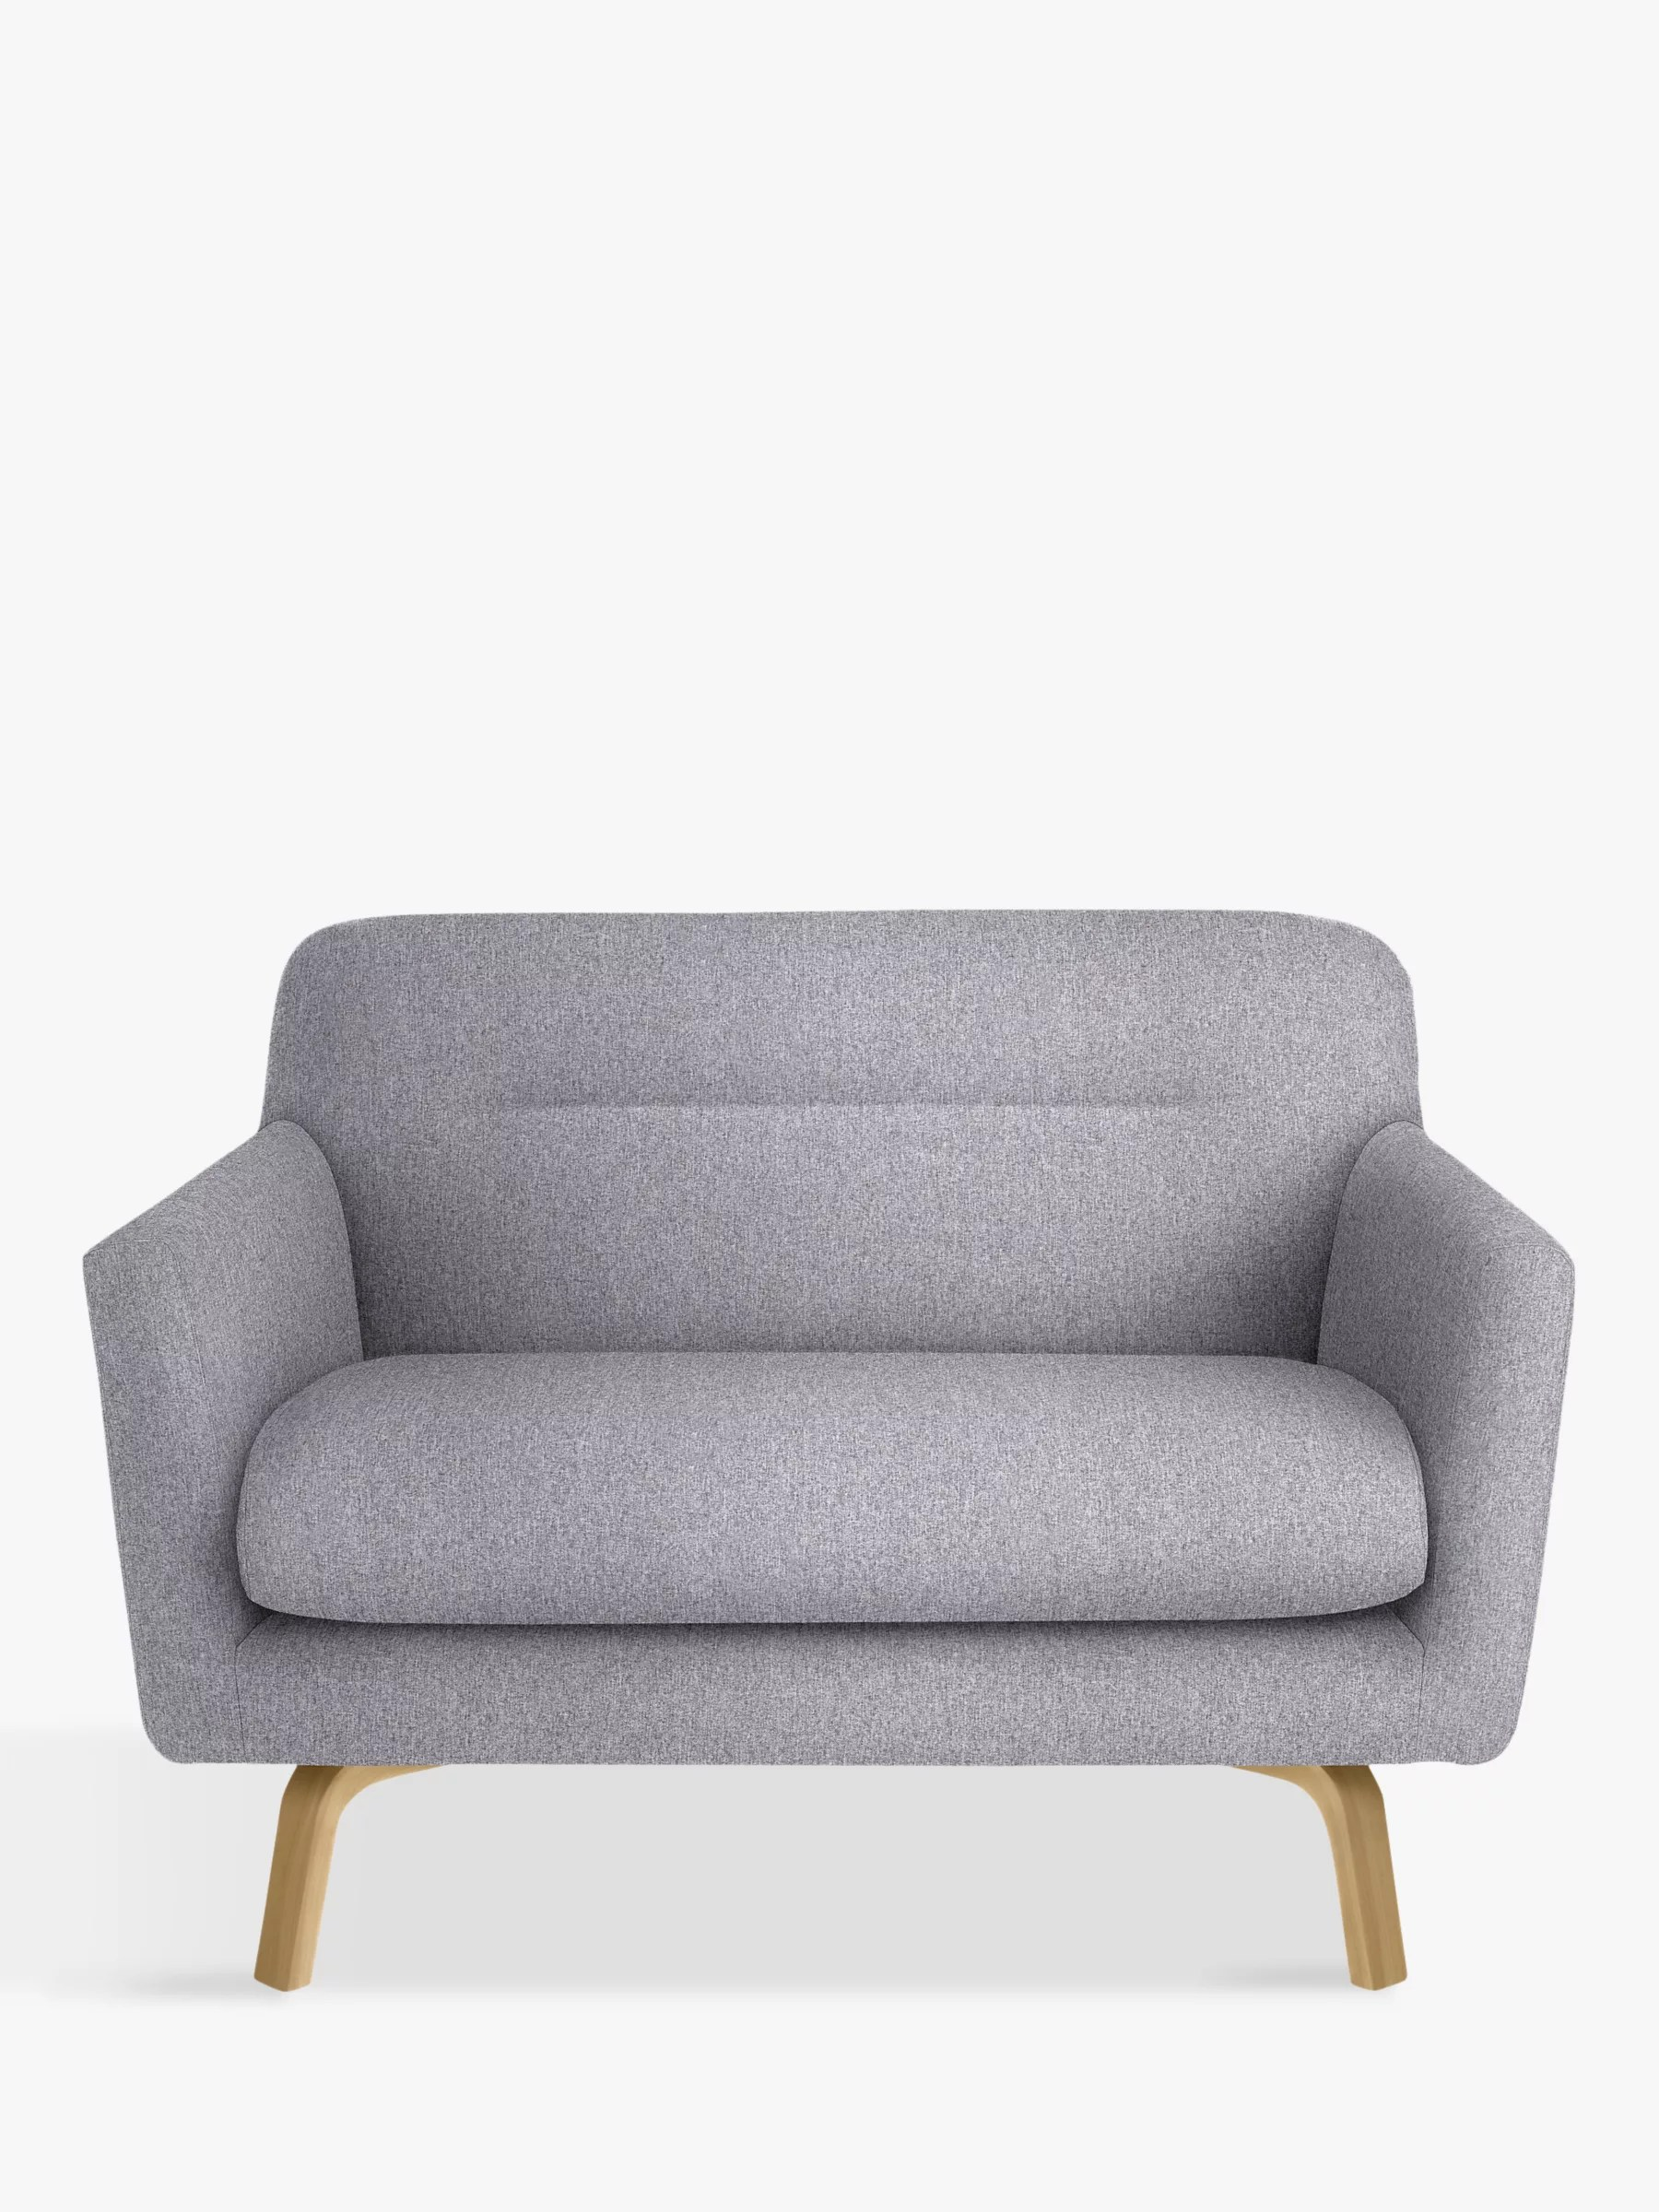 small grey sofa z gallerie craigslist house by john lewis archie 2 seater light leg